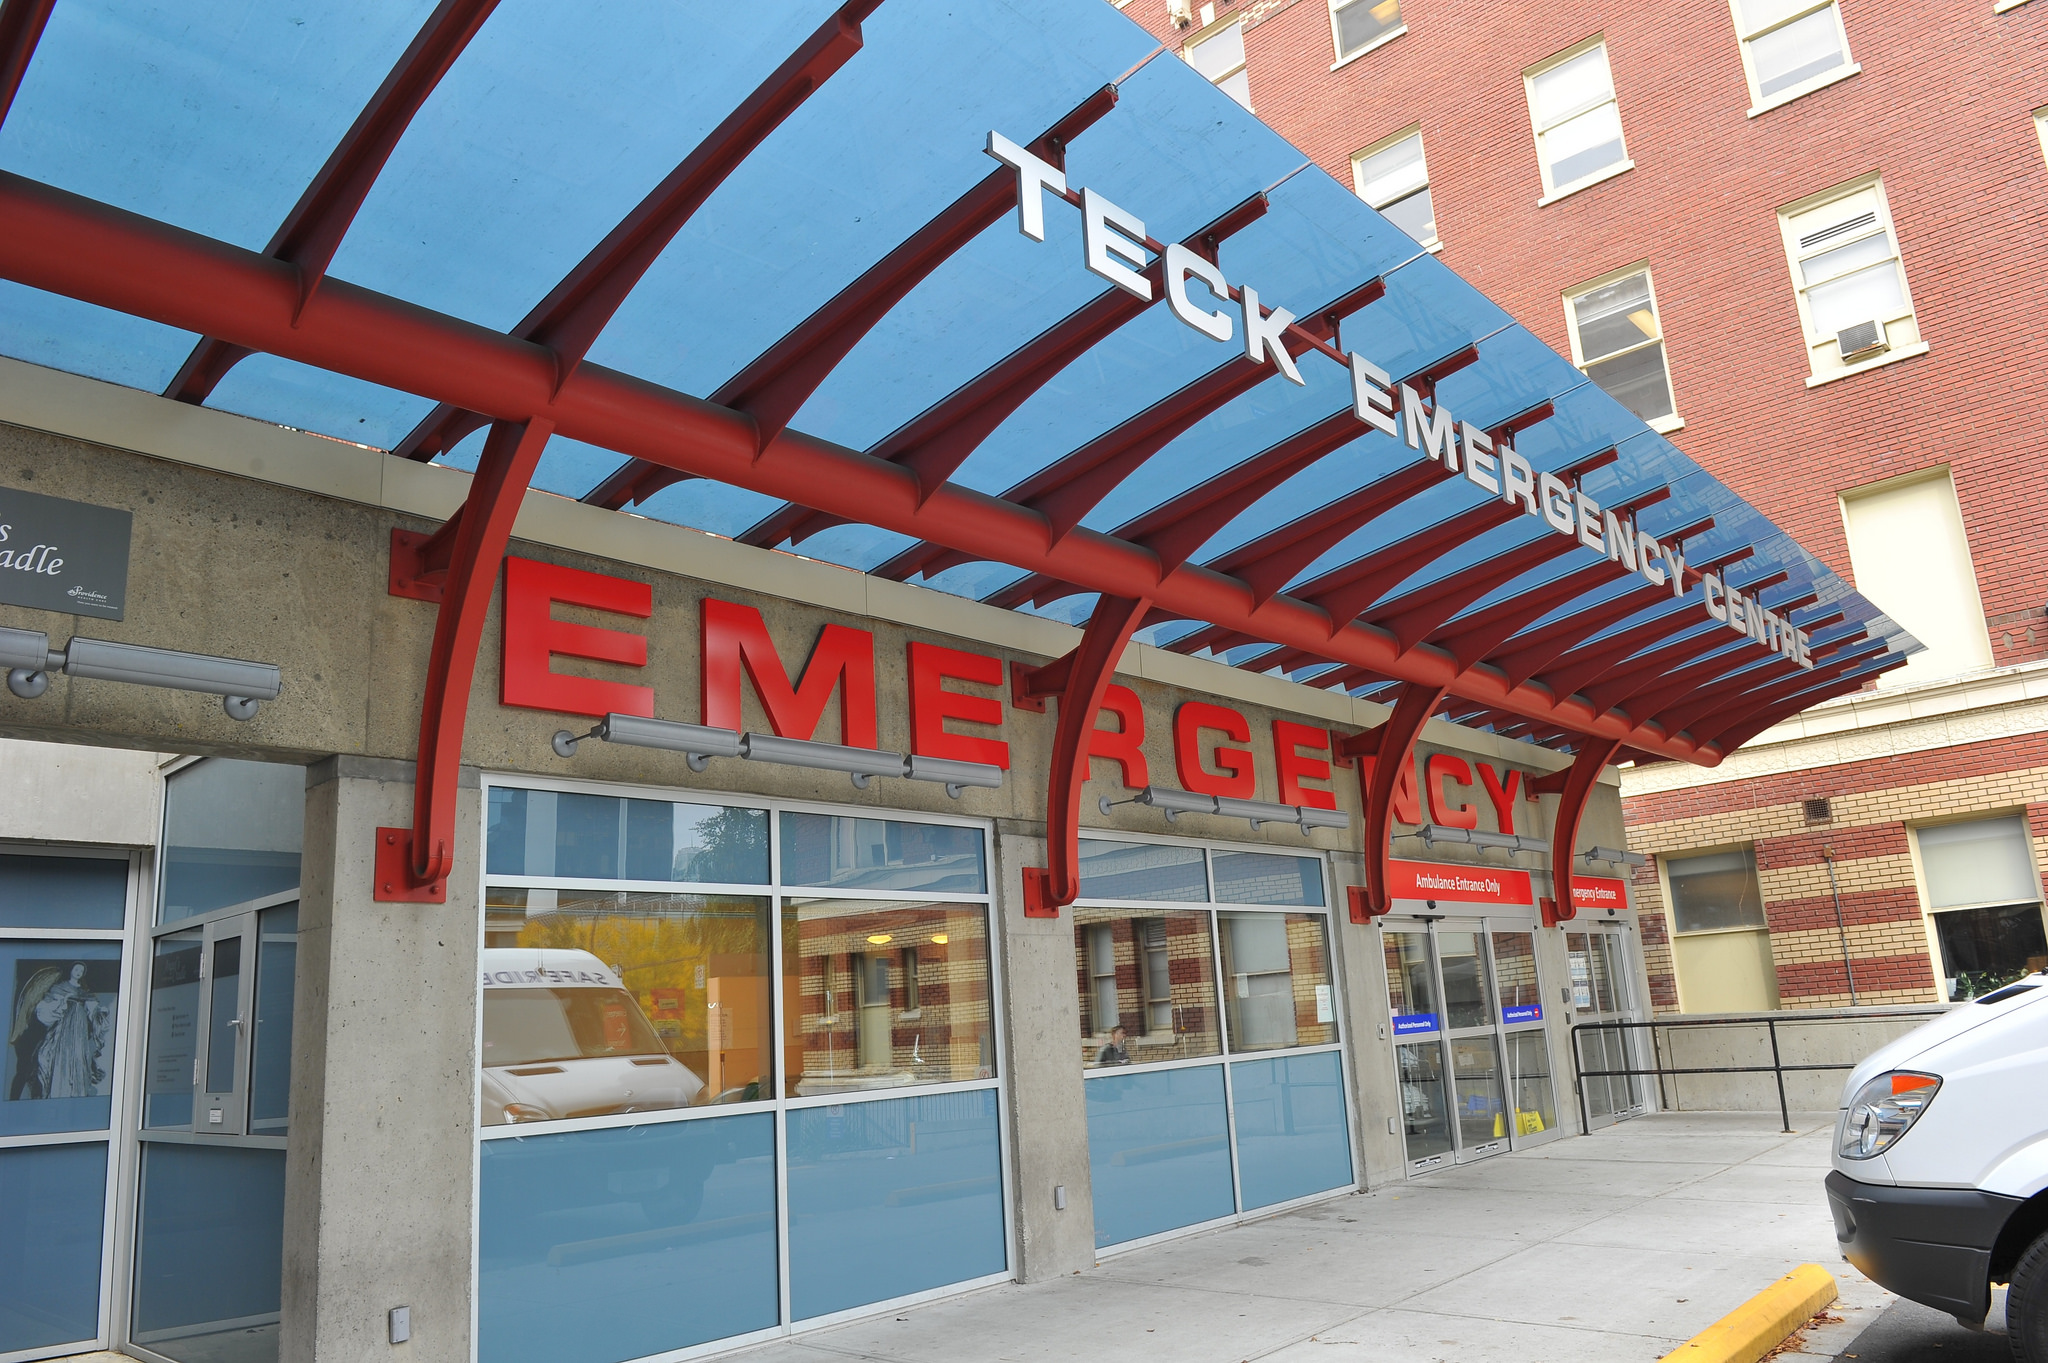 Exterior shot of St. Paul's Hospital Emergency entrance.